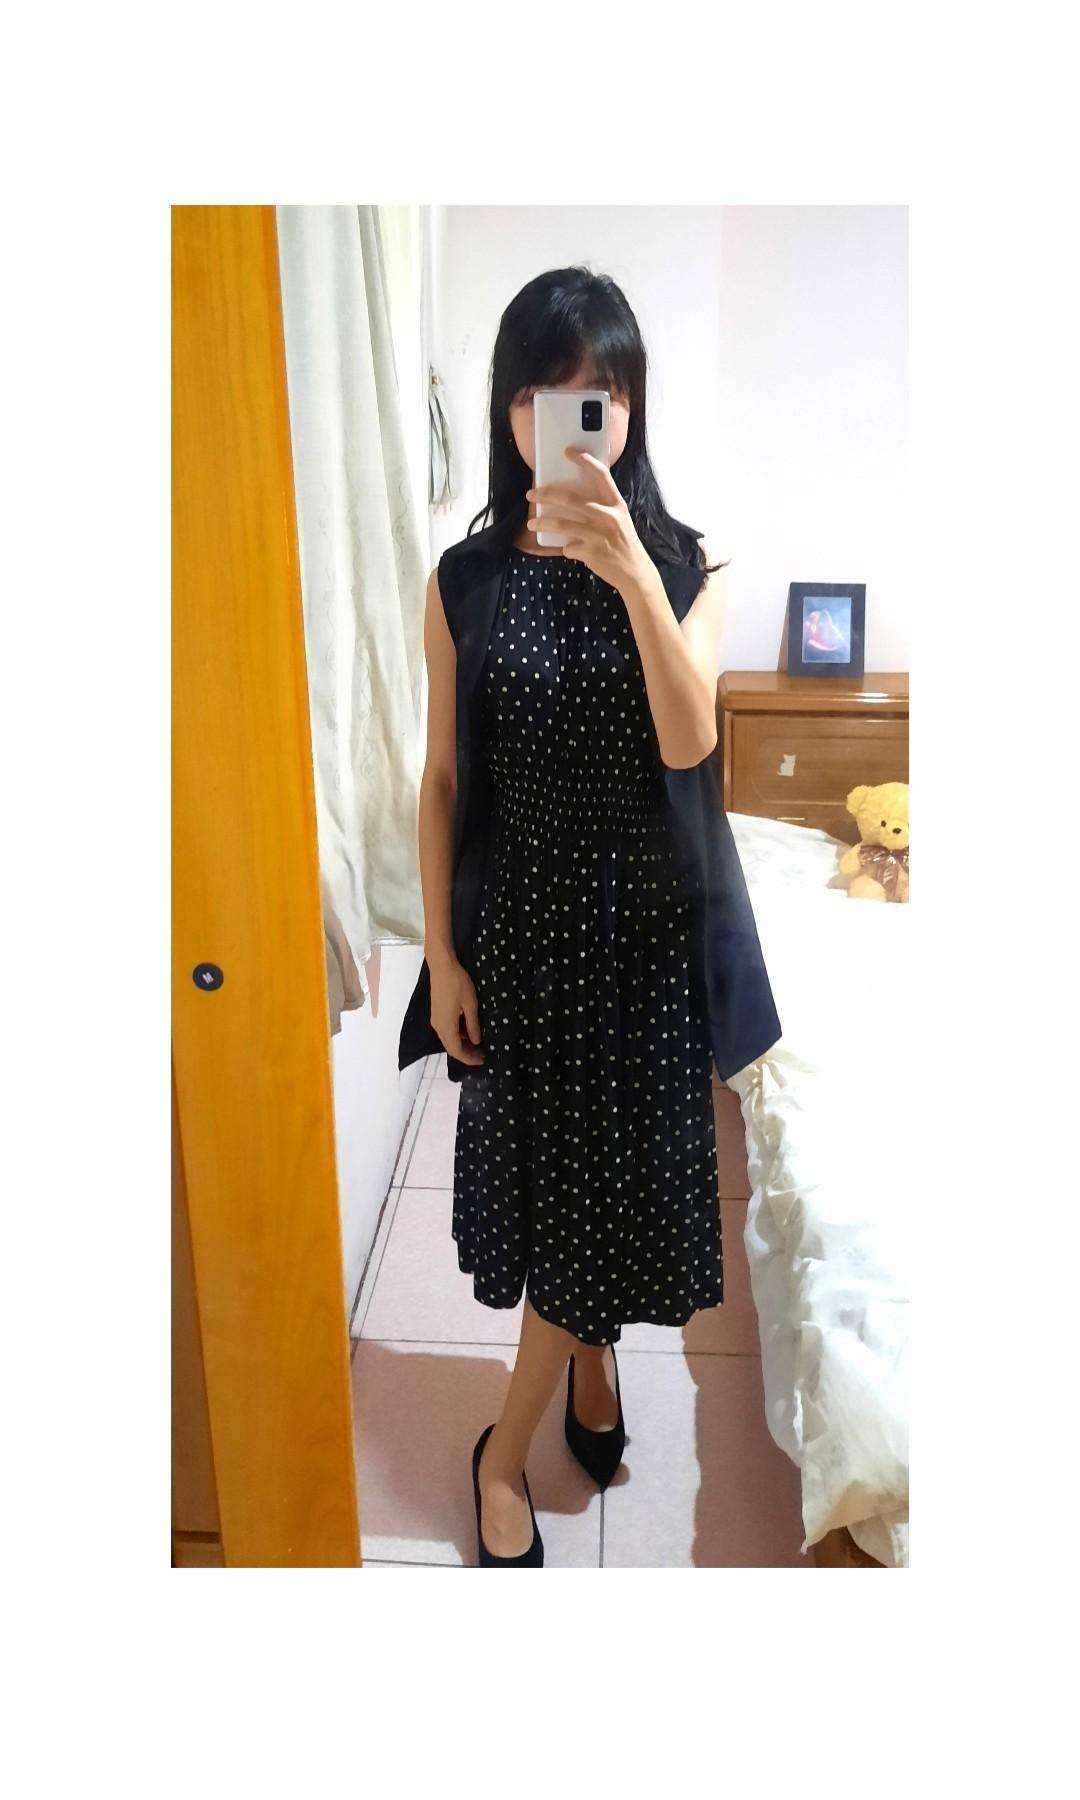 Unique 上班族點點縮腰洋裝 配無袖罩衫 一組價 正式 氣質洋裝 修身#週慶 (點擊圖片看完整穿搭)